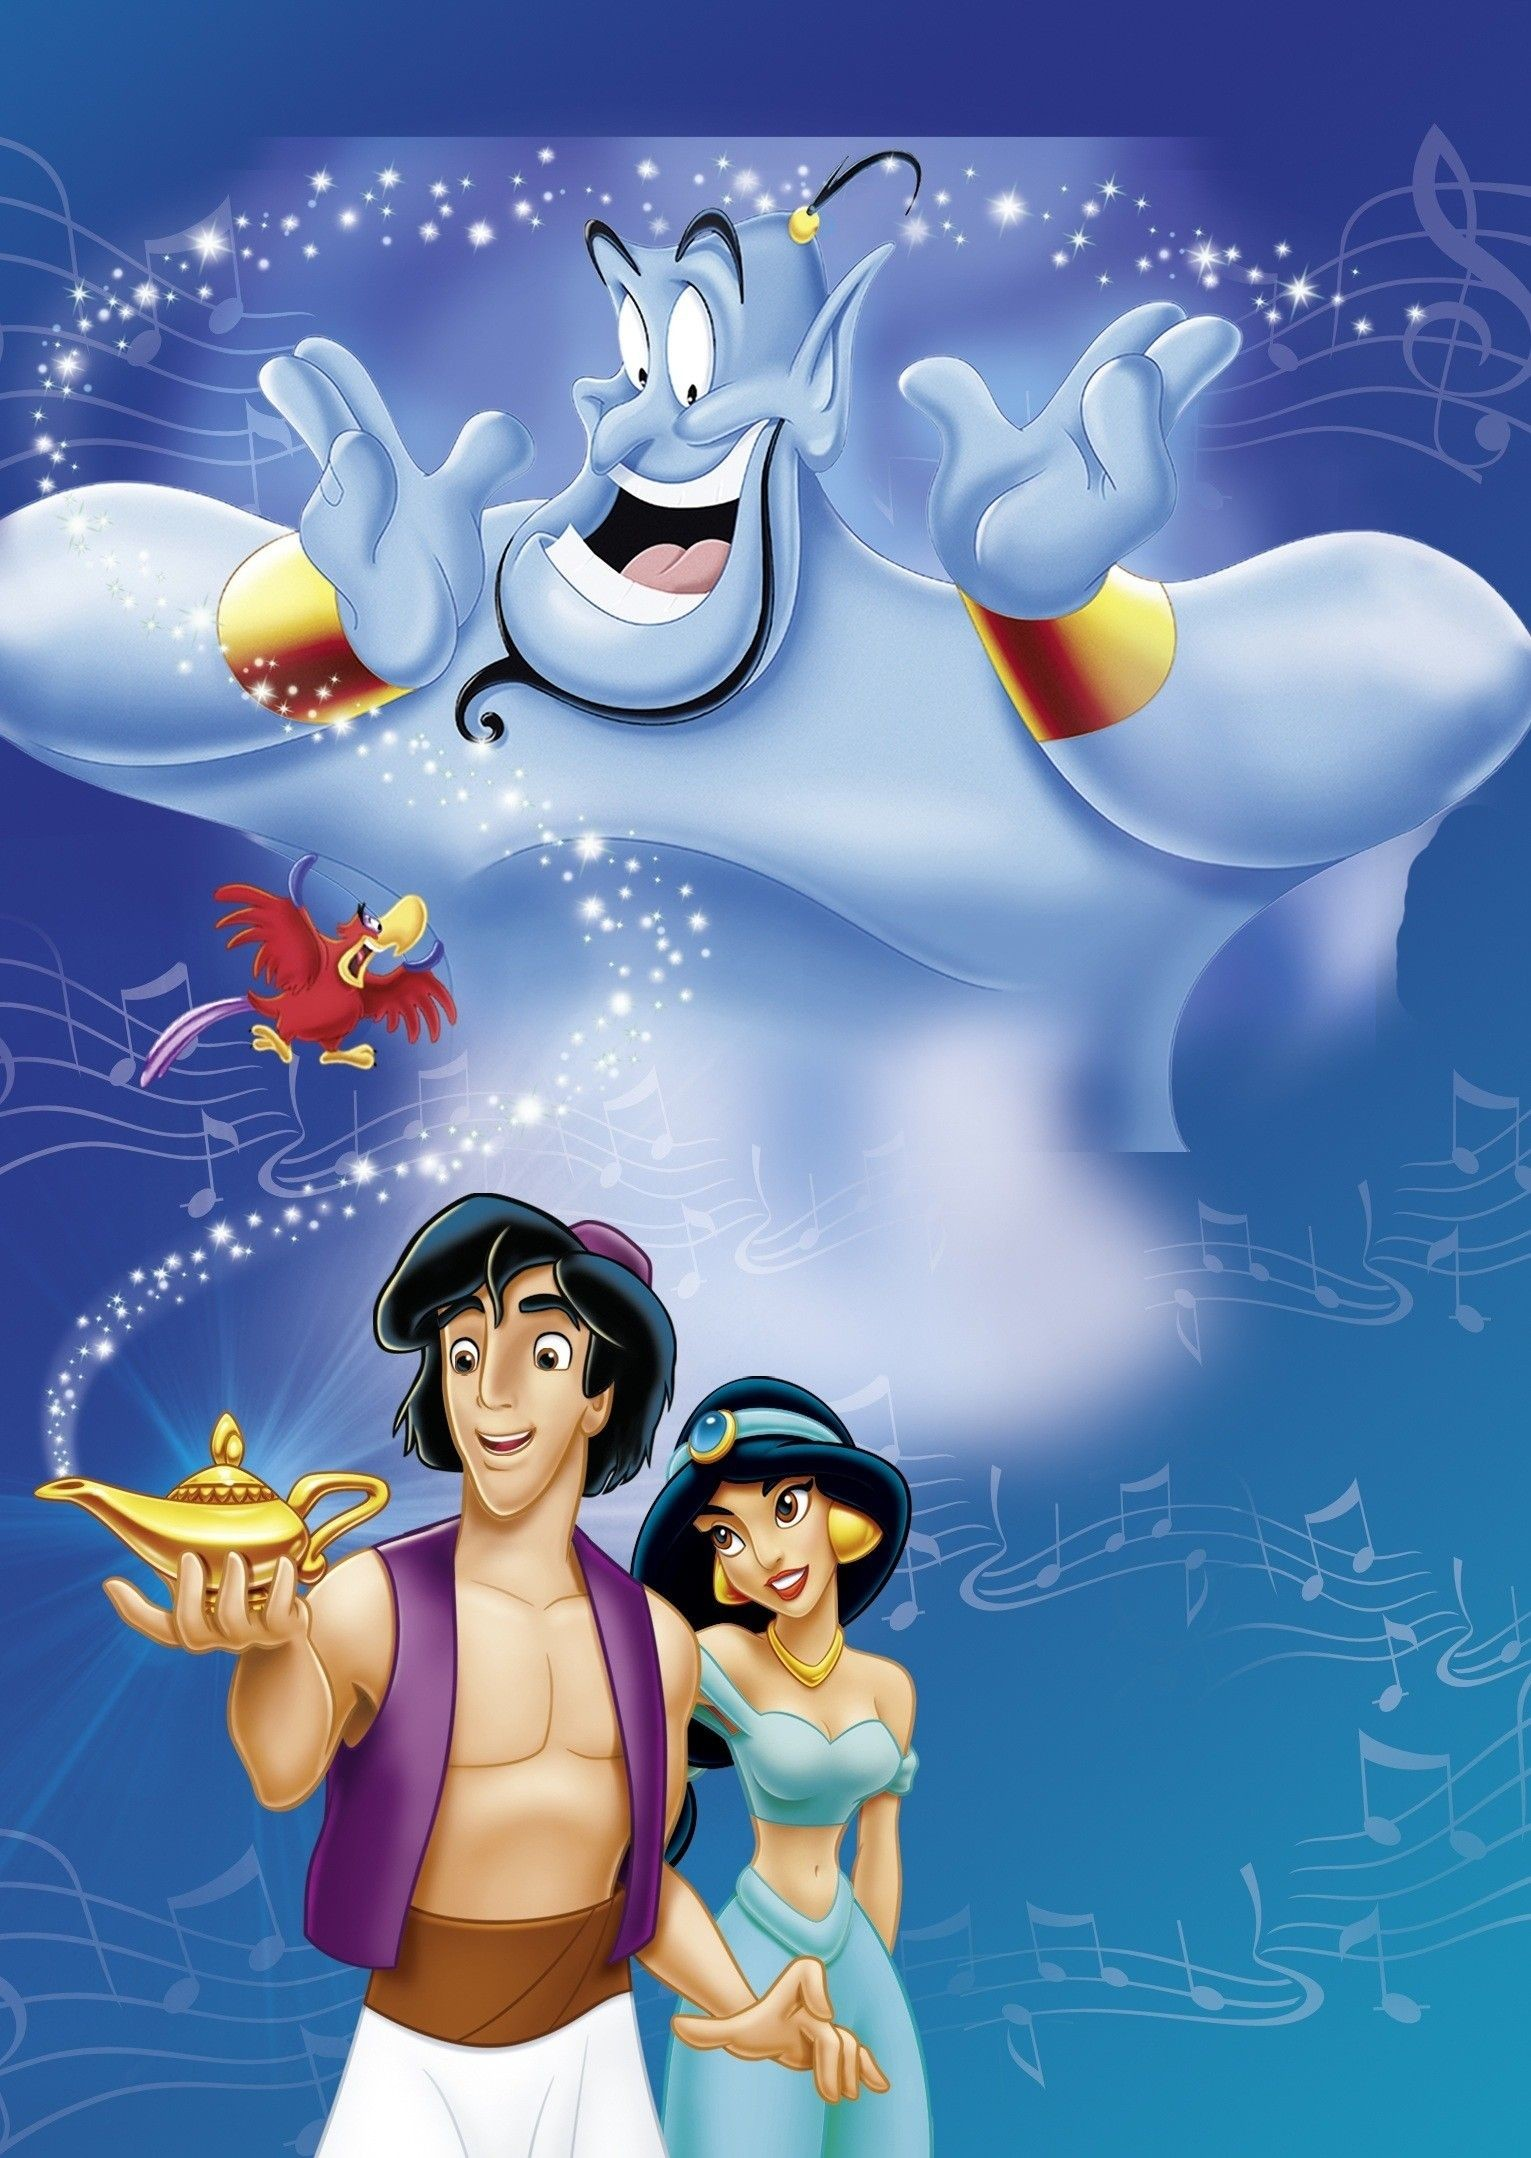 Res: 1531x2158, Jasmine Disney Wallpaper (65+ images)